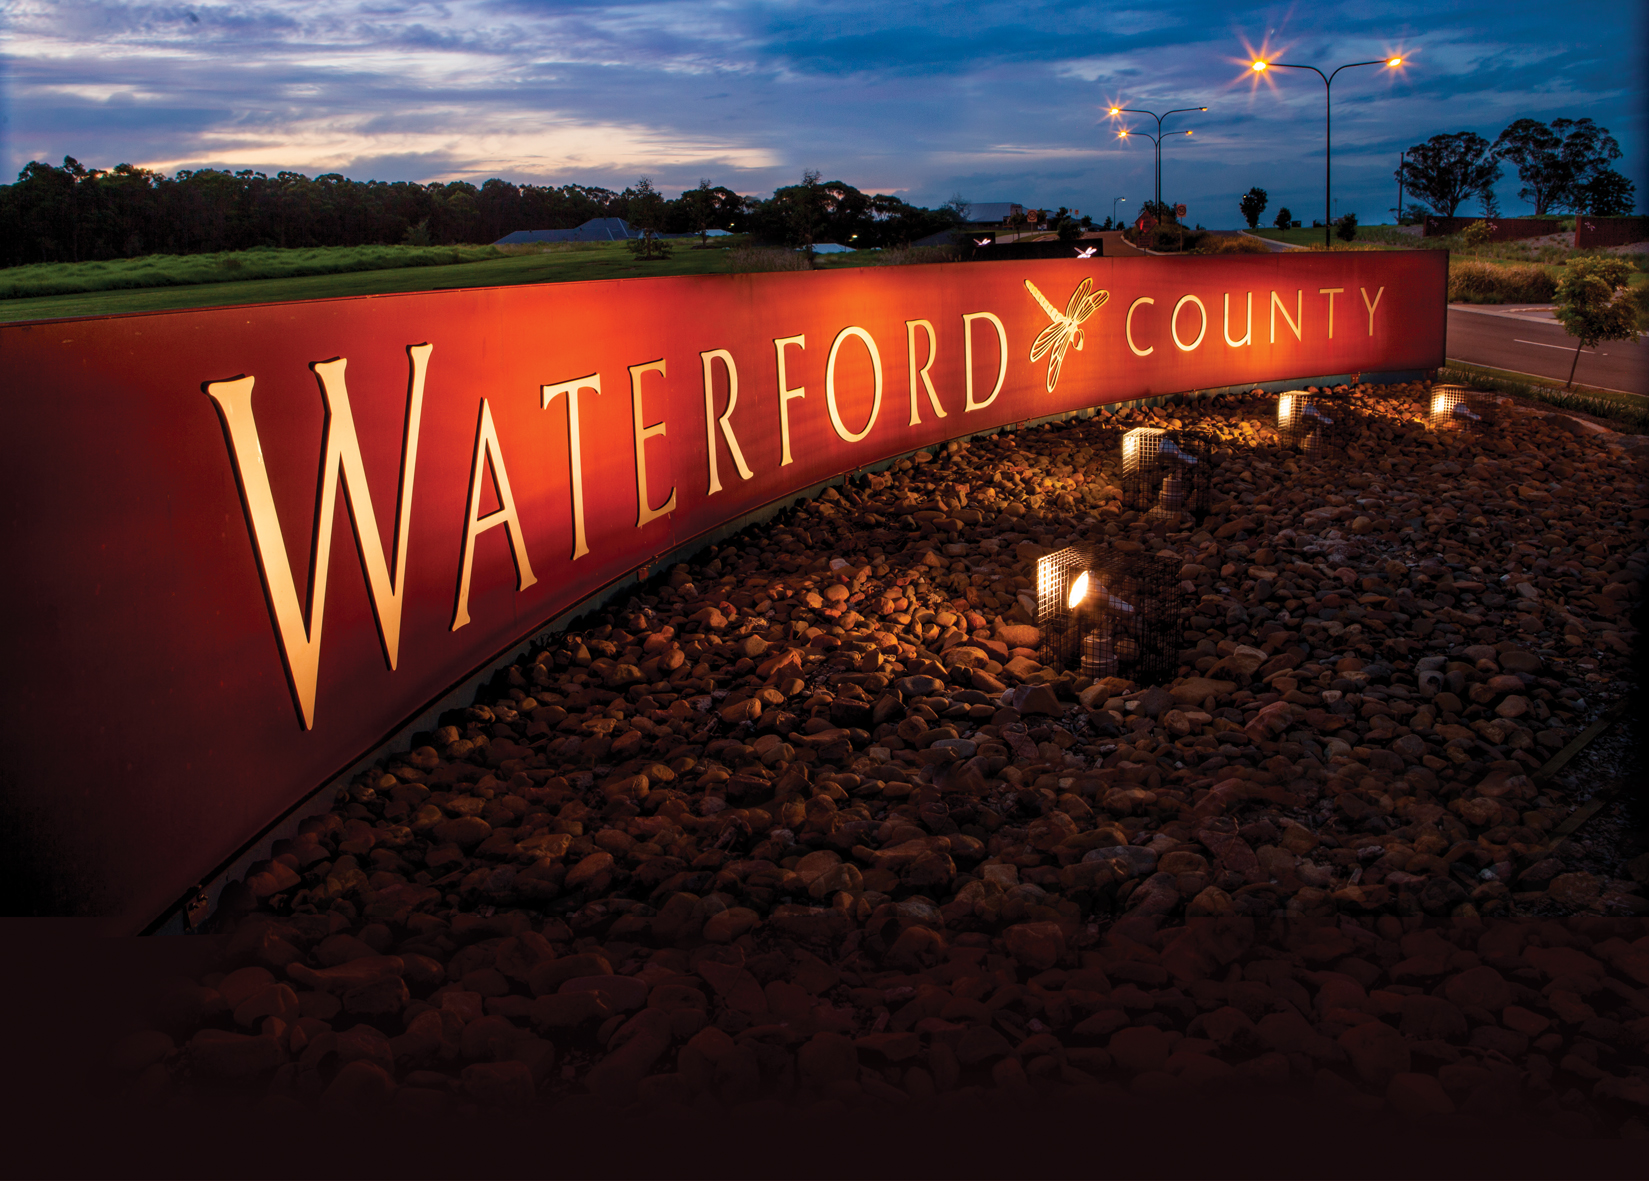 Waterford County.jpg